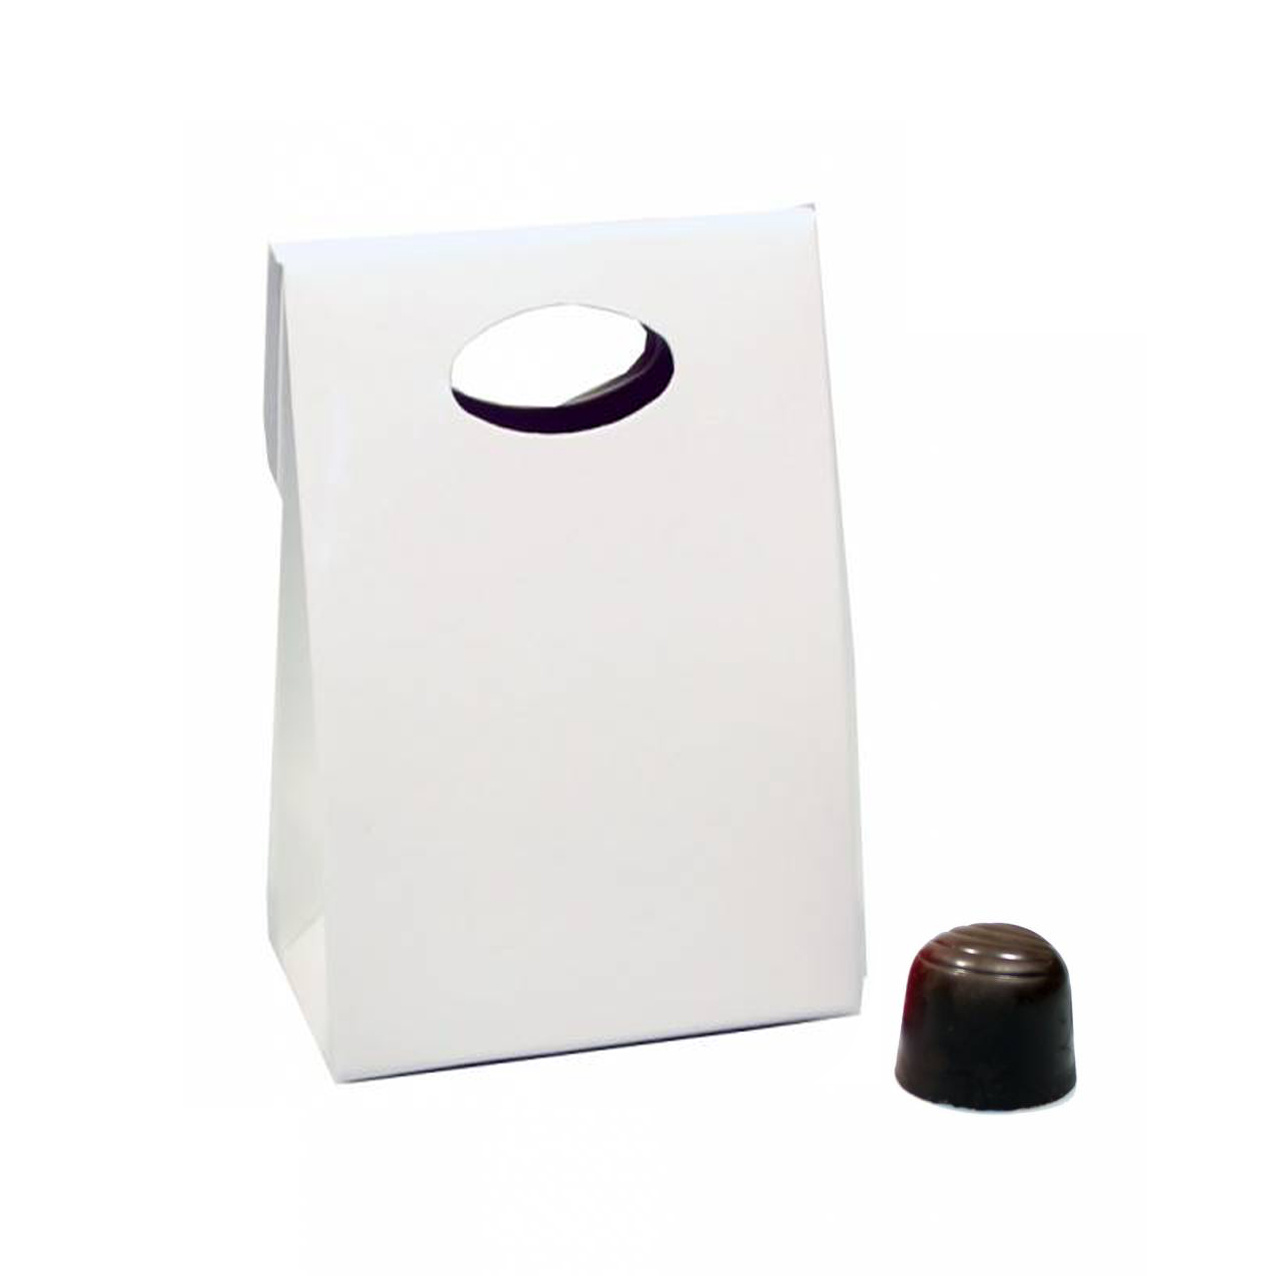 Funbox Weiß - 80*40*130mm - 100 Stück